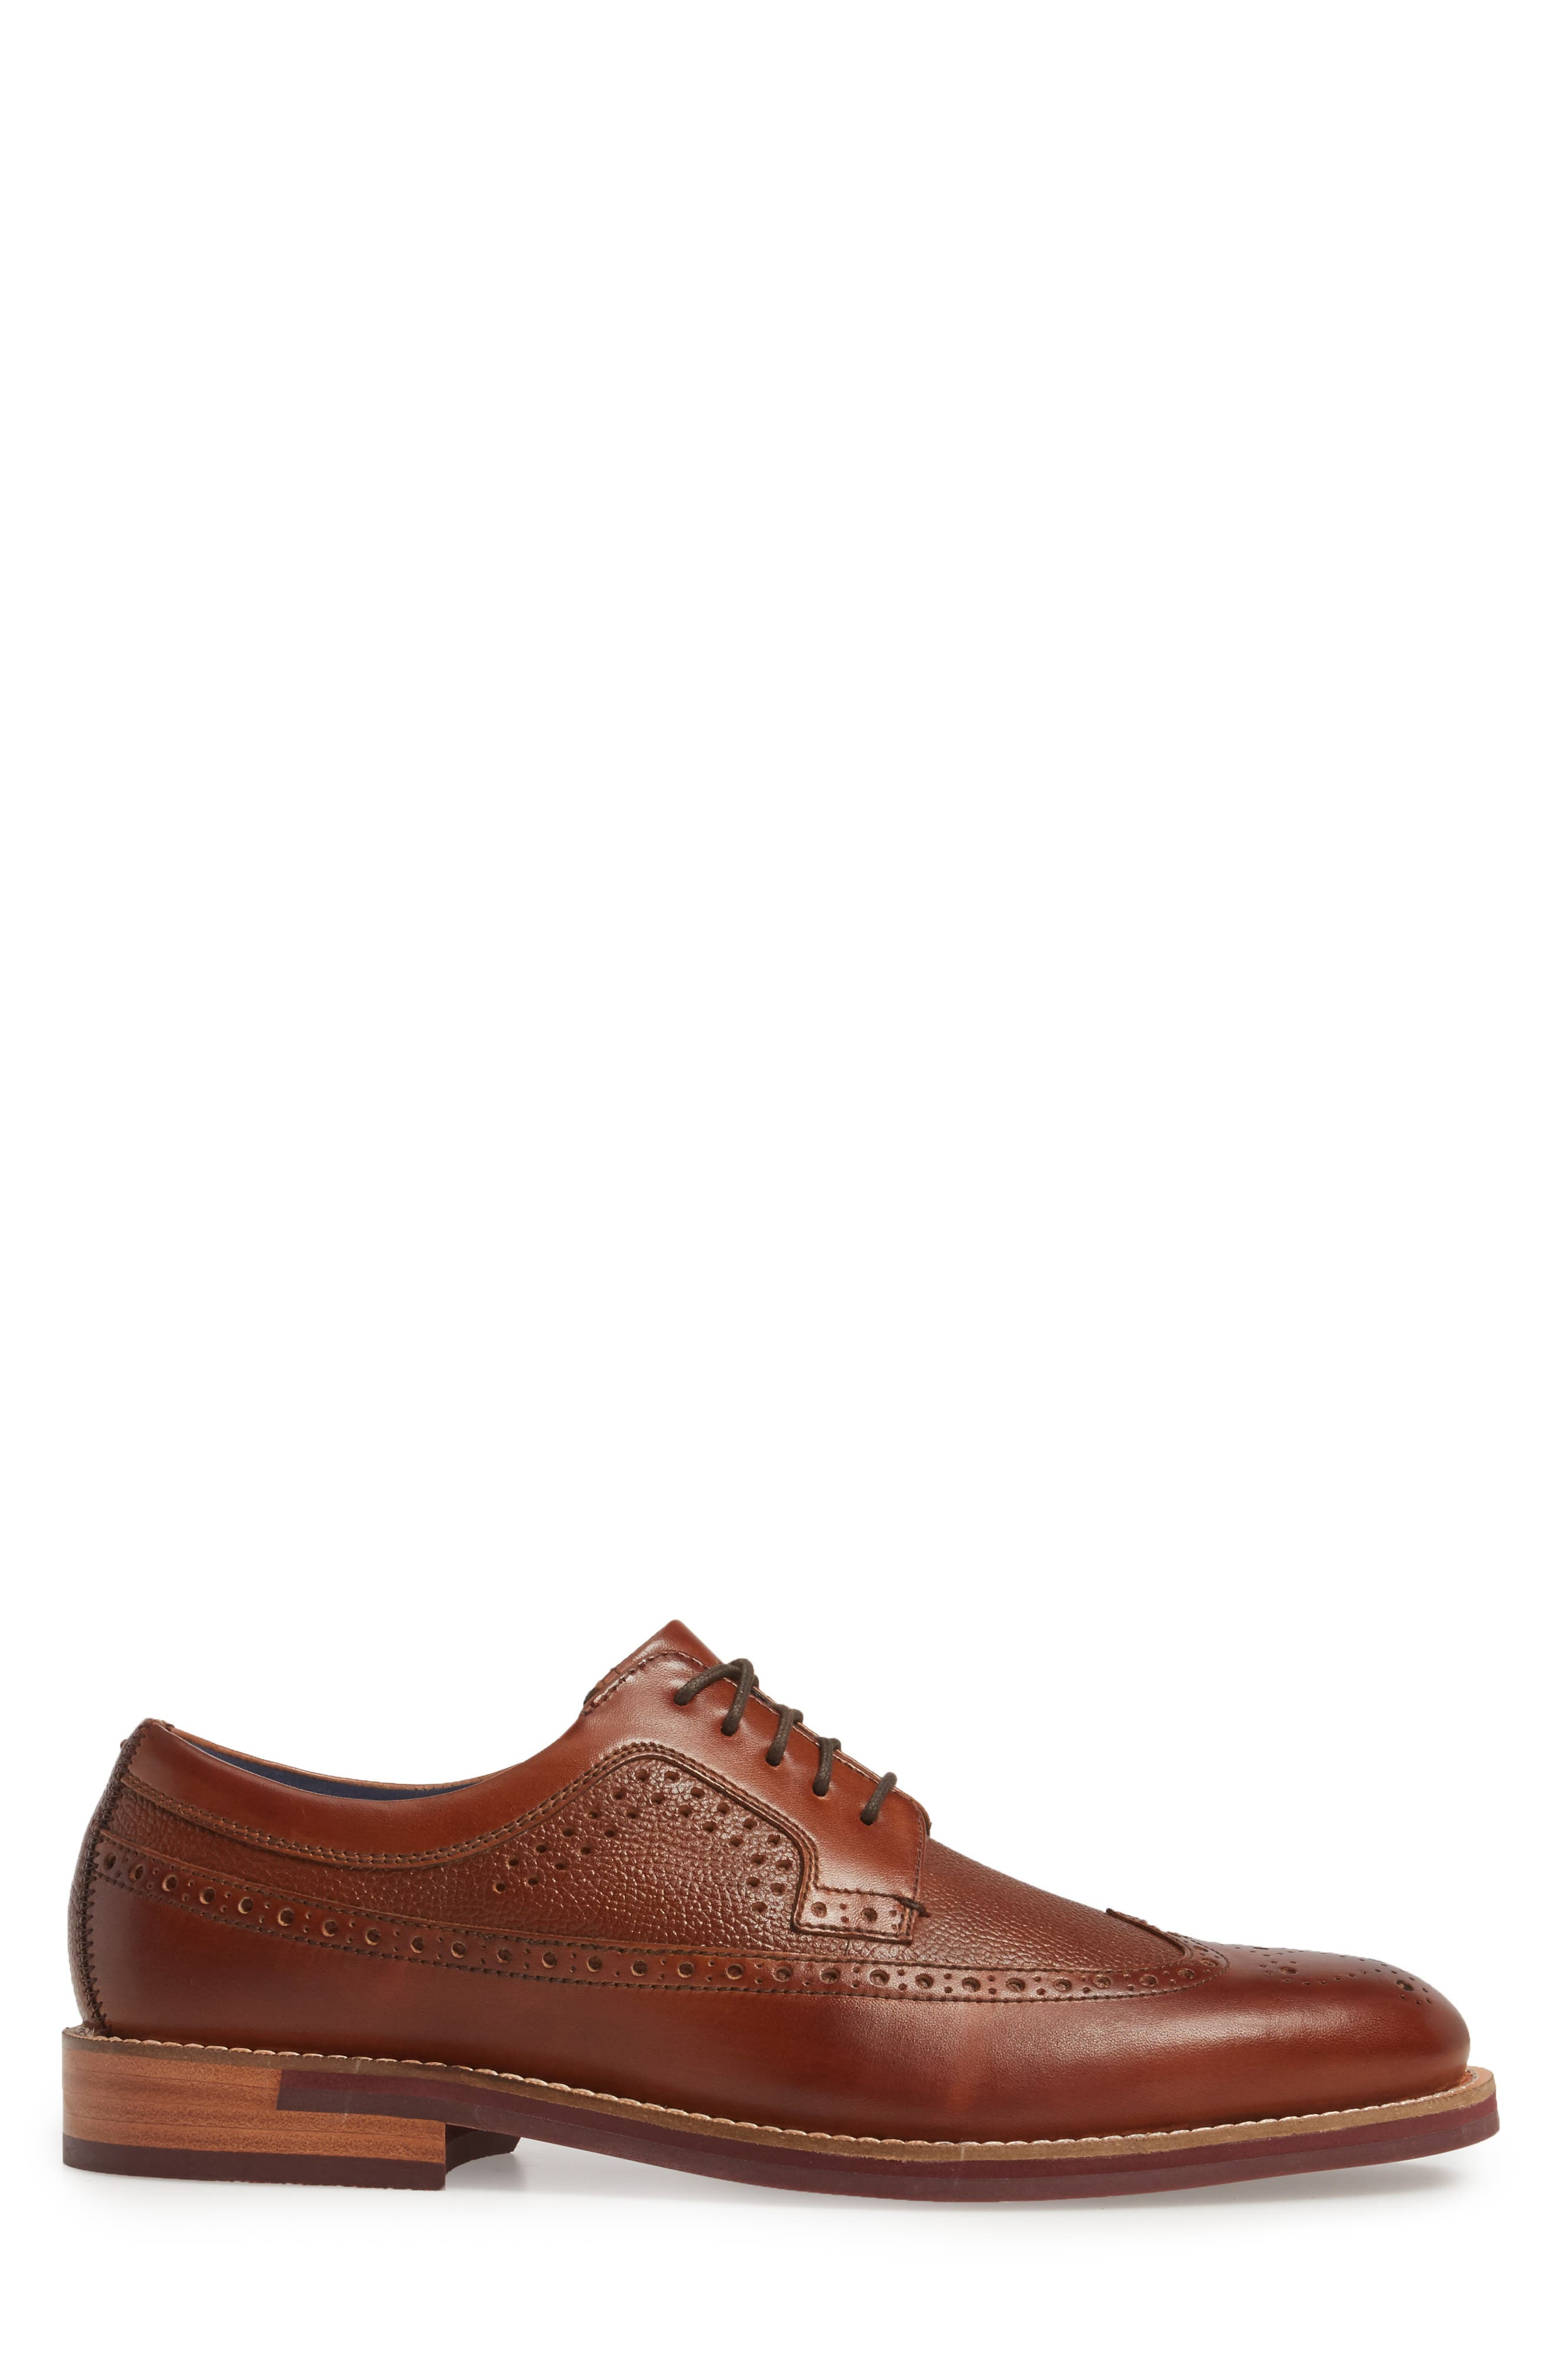 Deelani Longwing Derby,                             Alternate thumbnail 3, color,                             Tan Leather